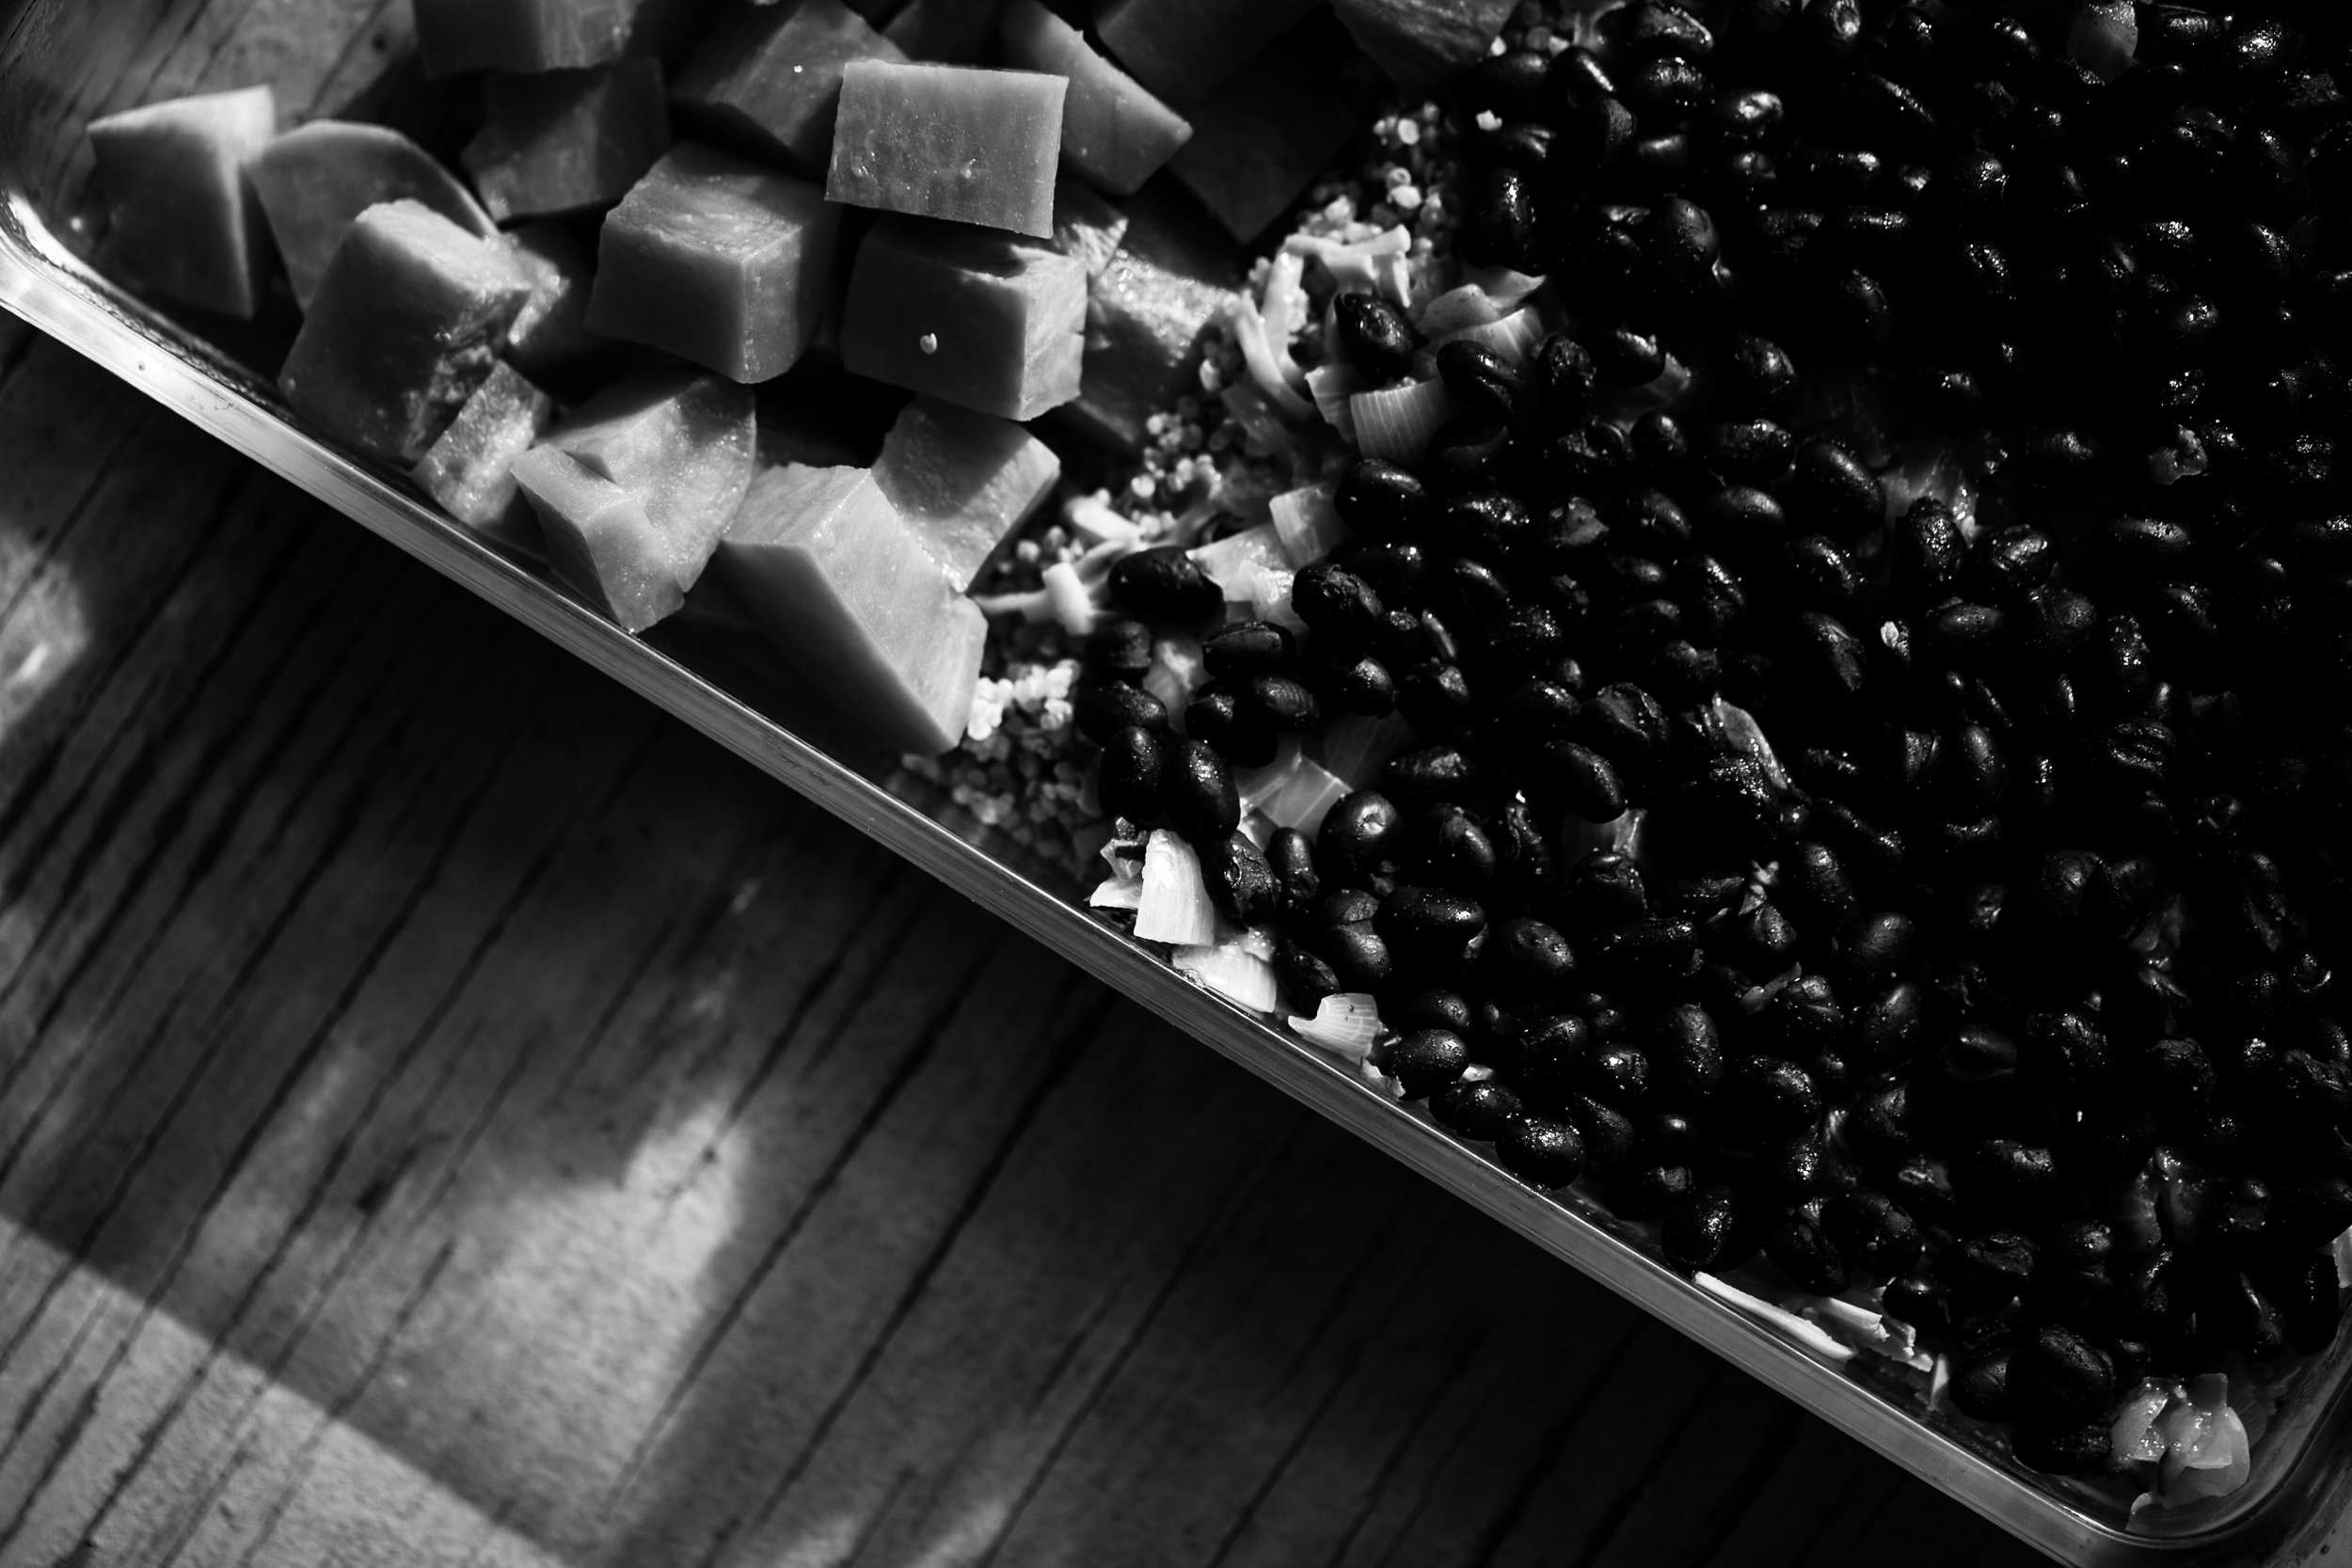 sweet-potatoes-quinoa-black-bean-cassarole-gluten-free-2.jpg